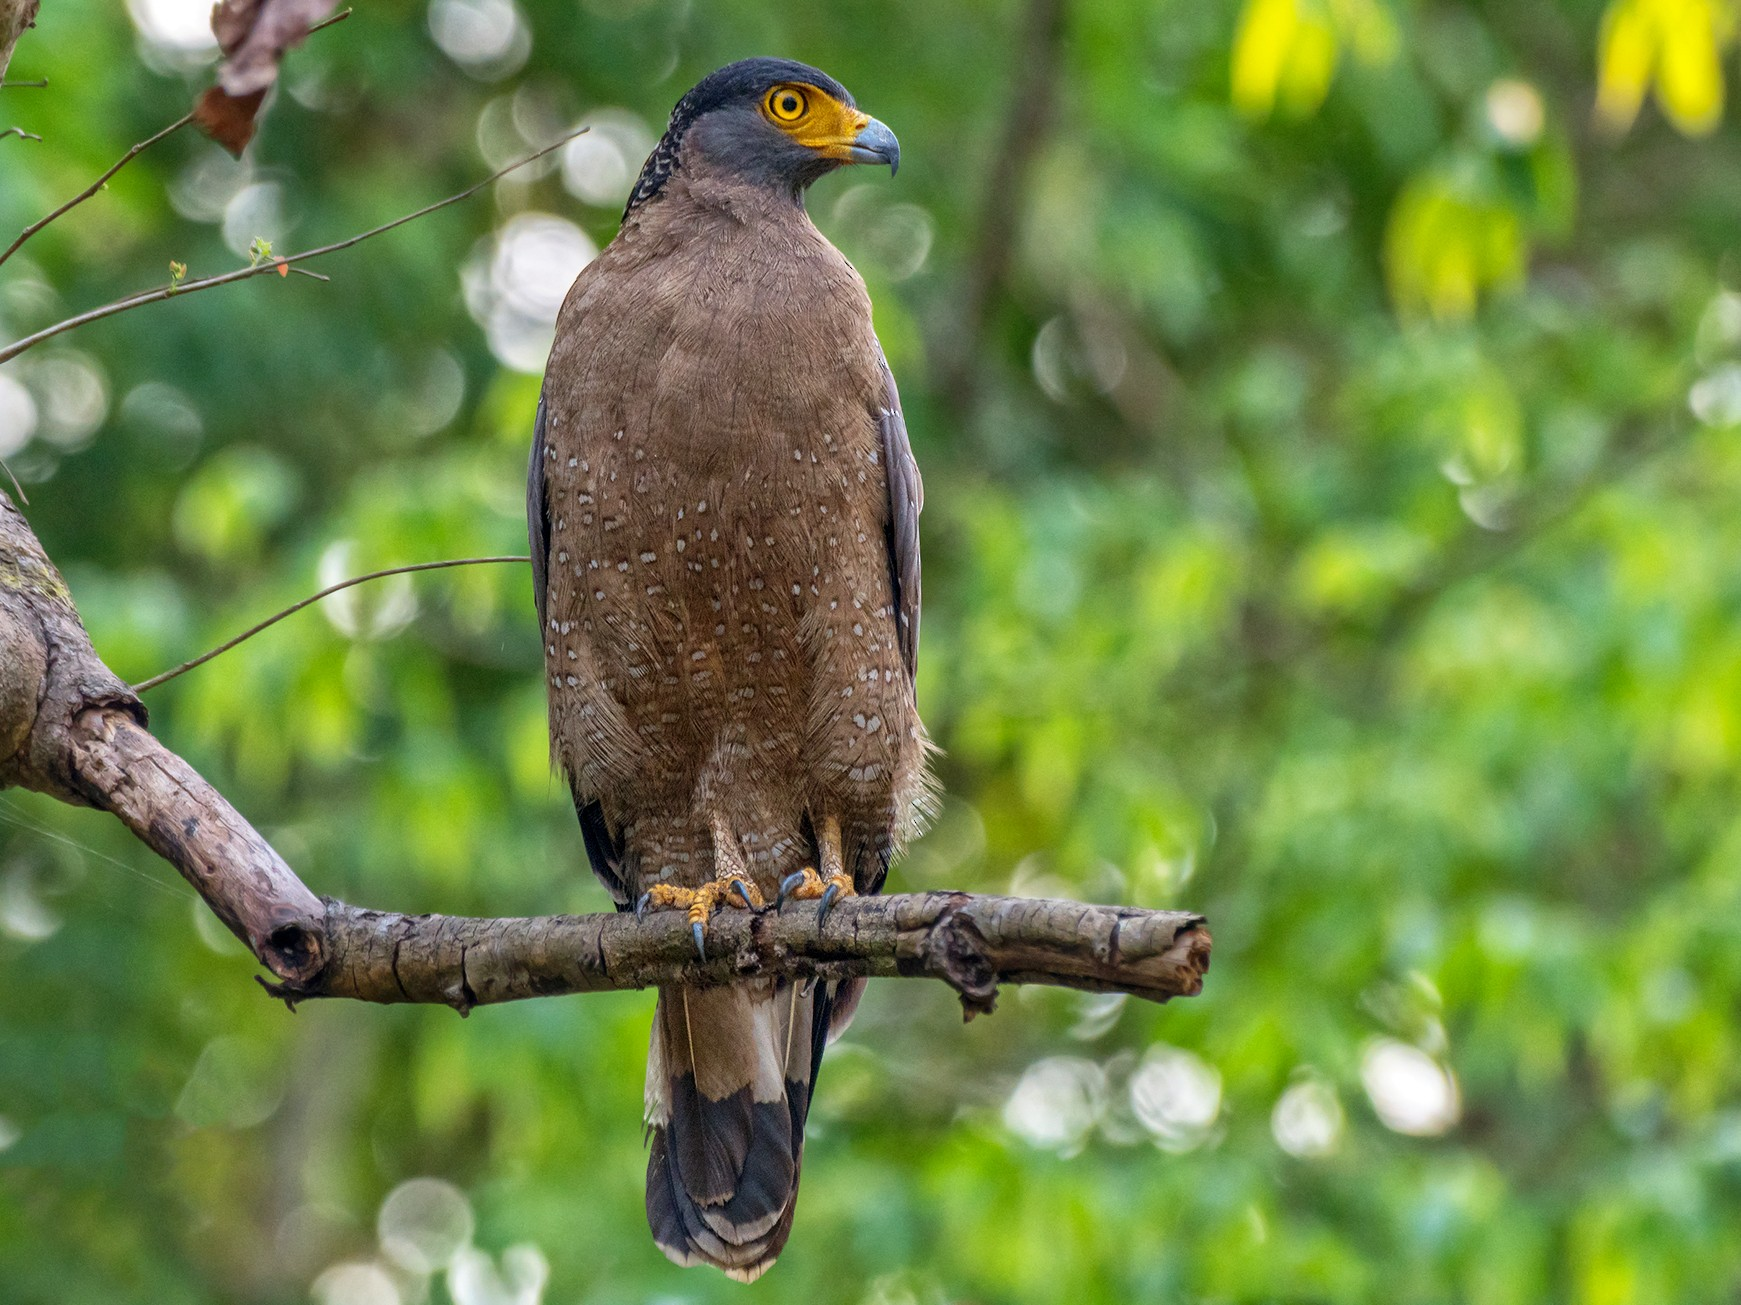 Crested Serpent-Eagle - Prasanna Kumar Mamidala